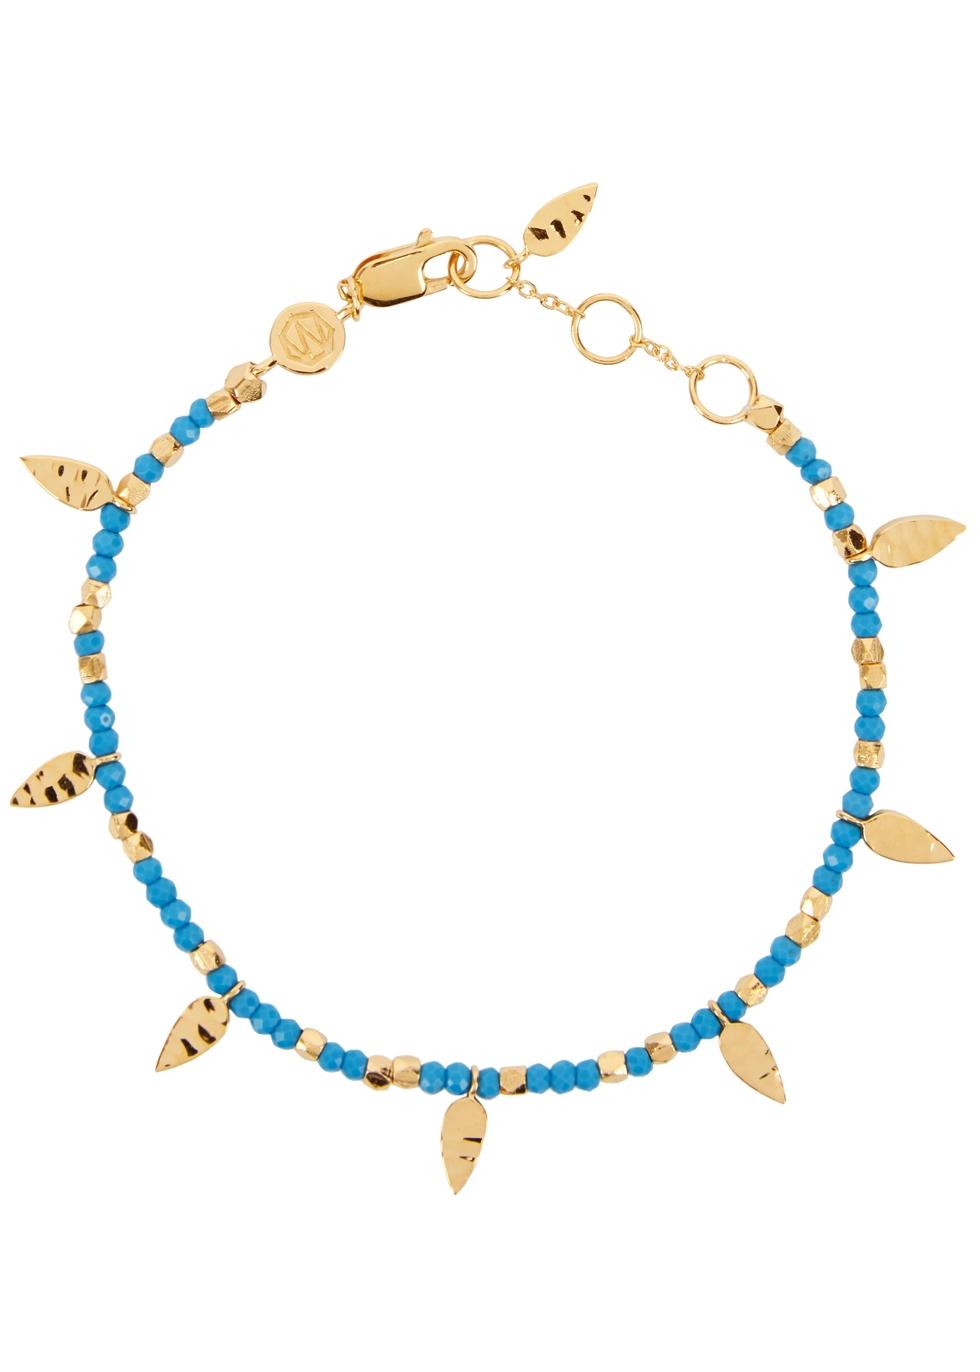 MISSOMA Turquoise Gold-Plated Bracelet